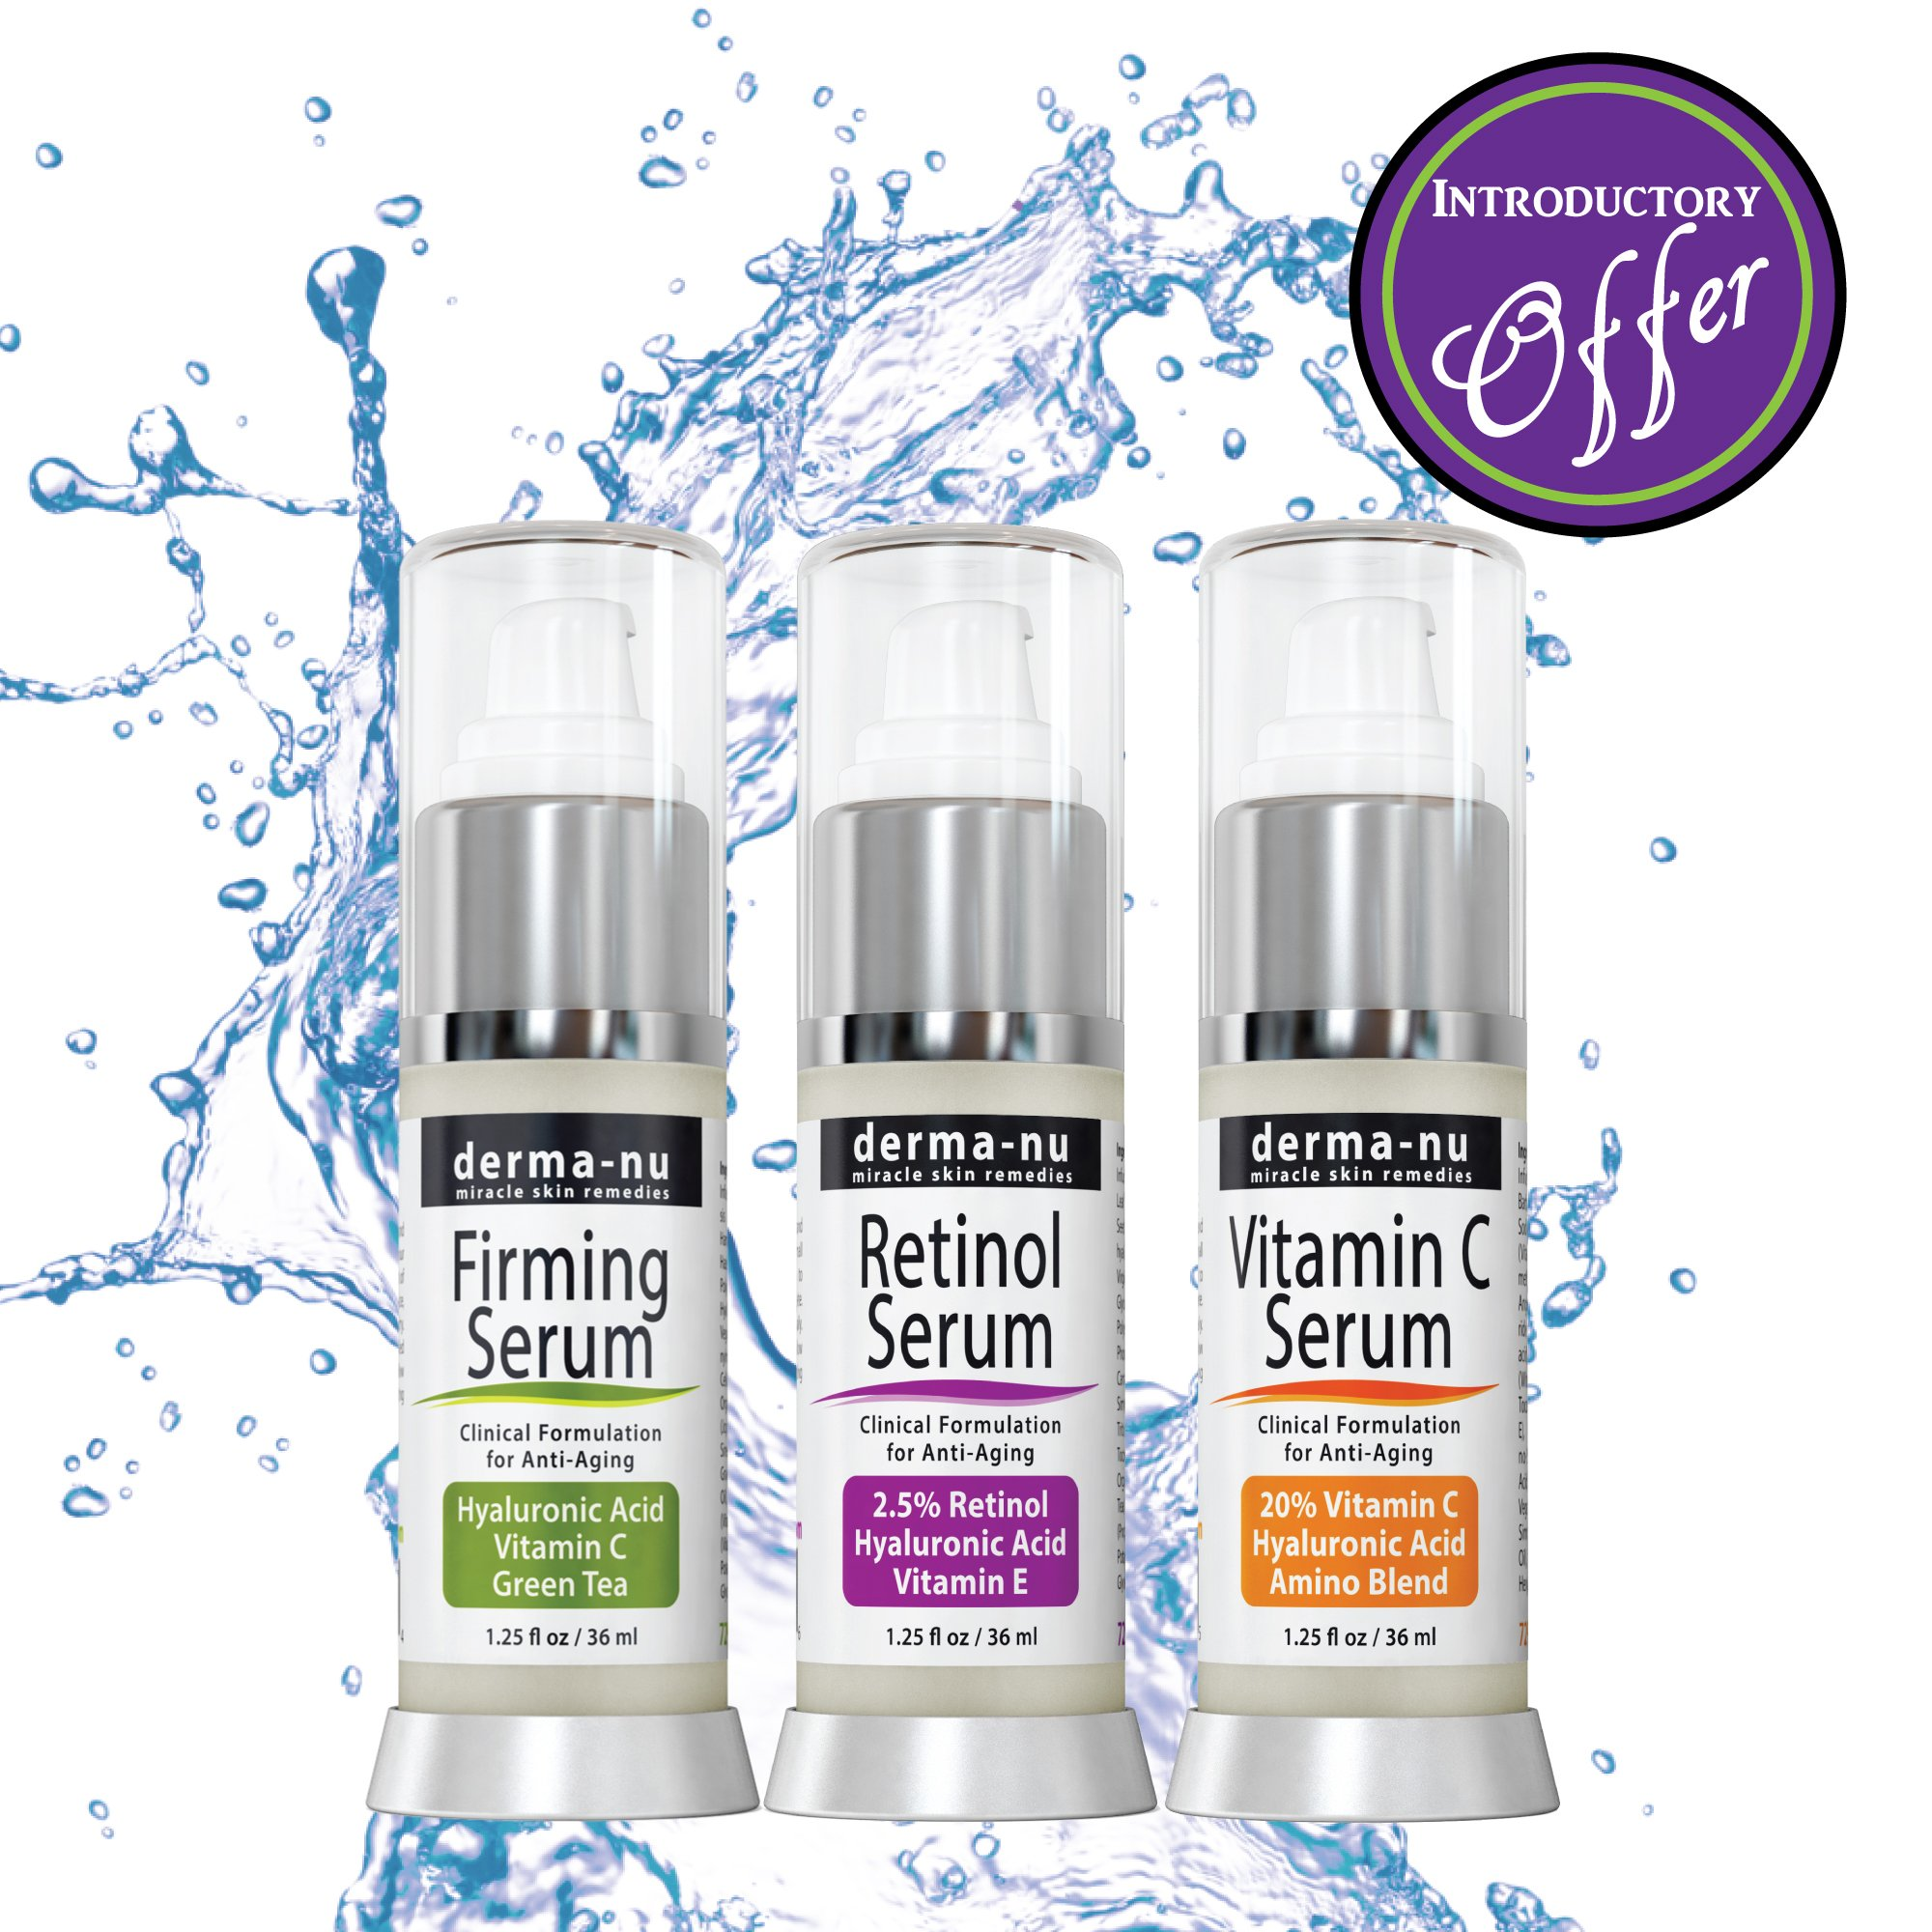 Anti Aging Serum Trio - Hyaluronic Acid, Retinol Serum & Vitamin C Serum 3 Pack by Derma-nu Skin Remedies